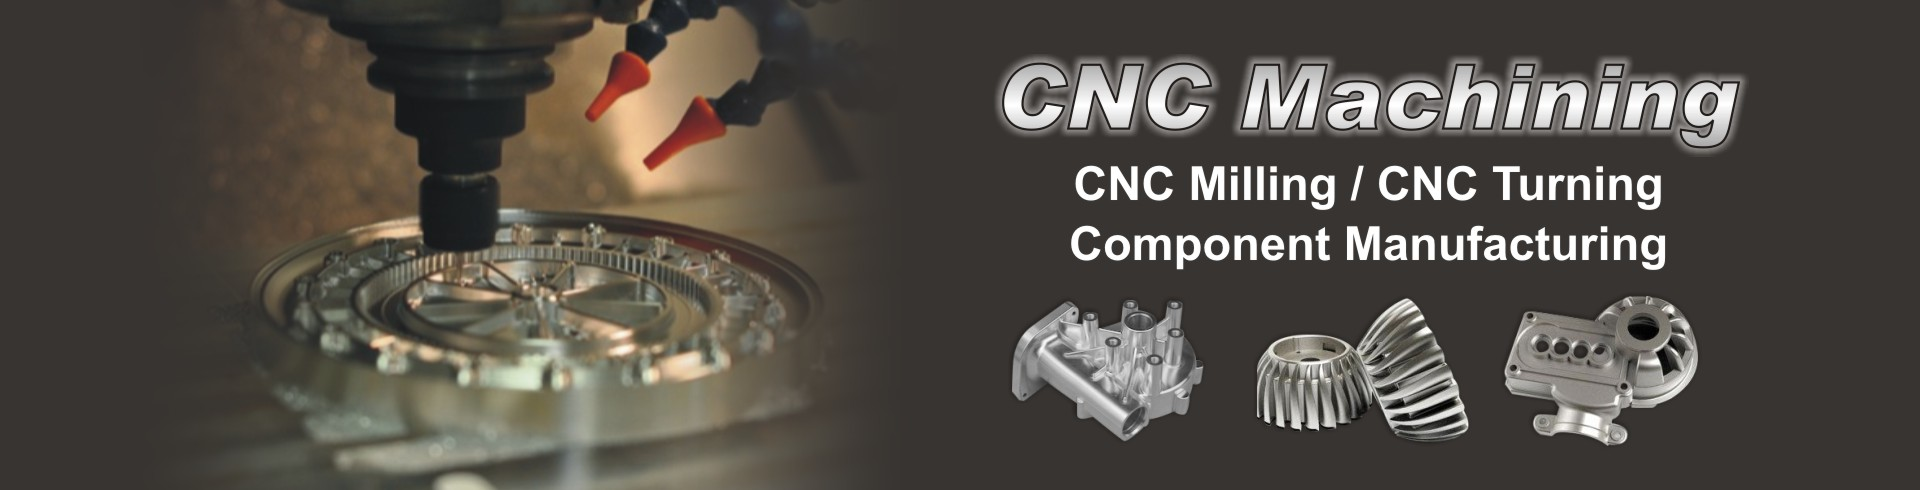 CNC machining - banner